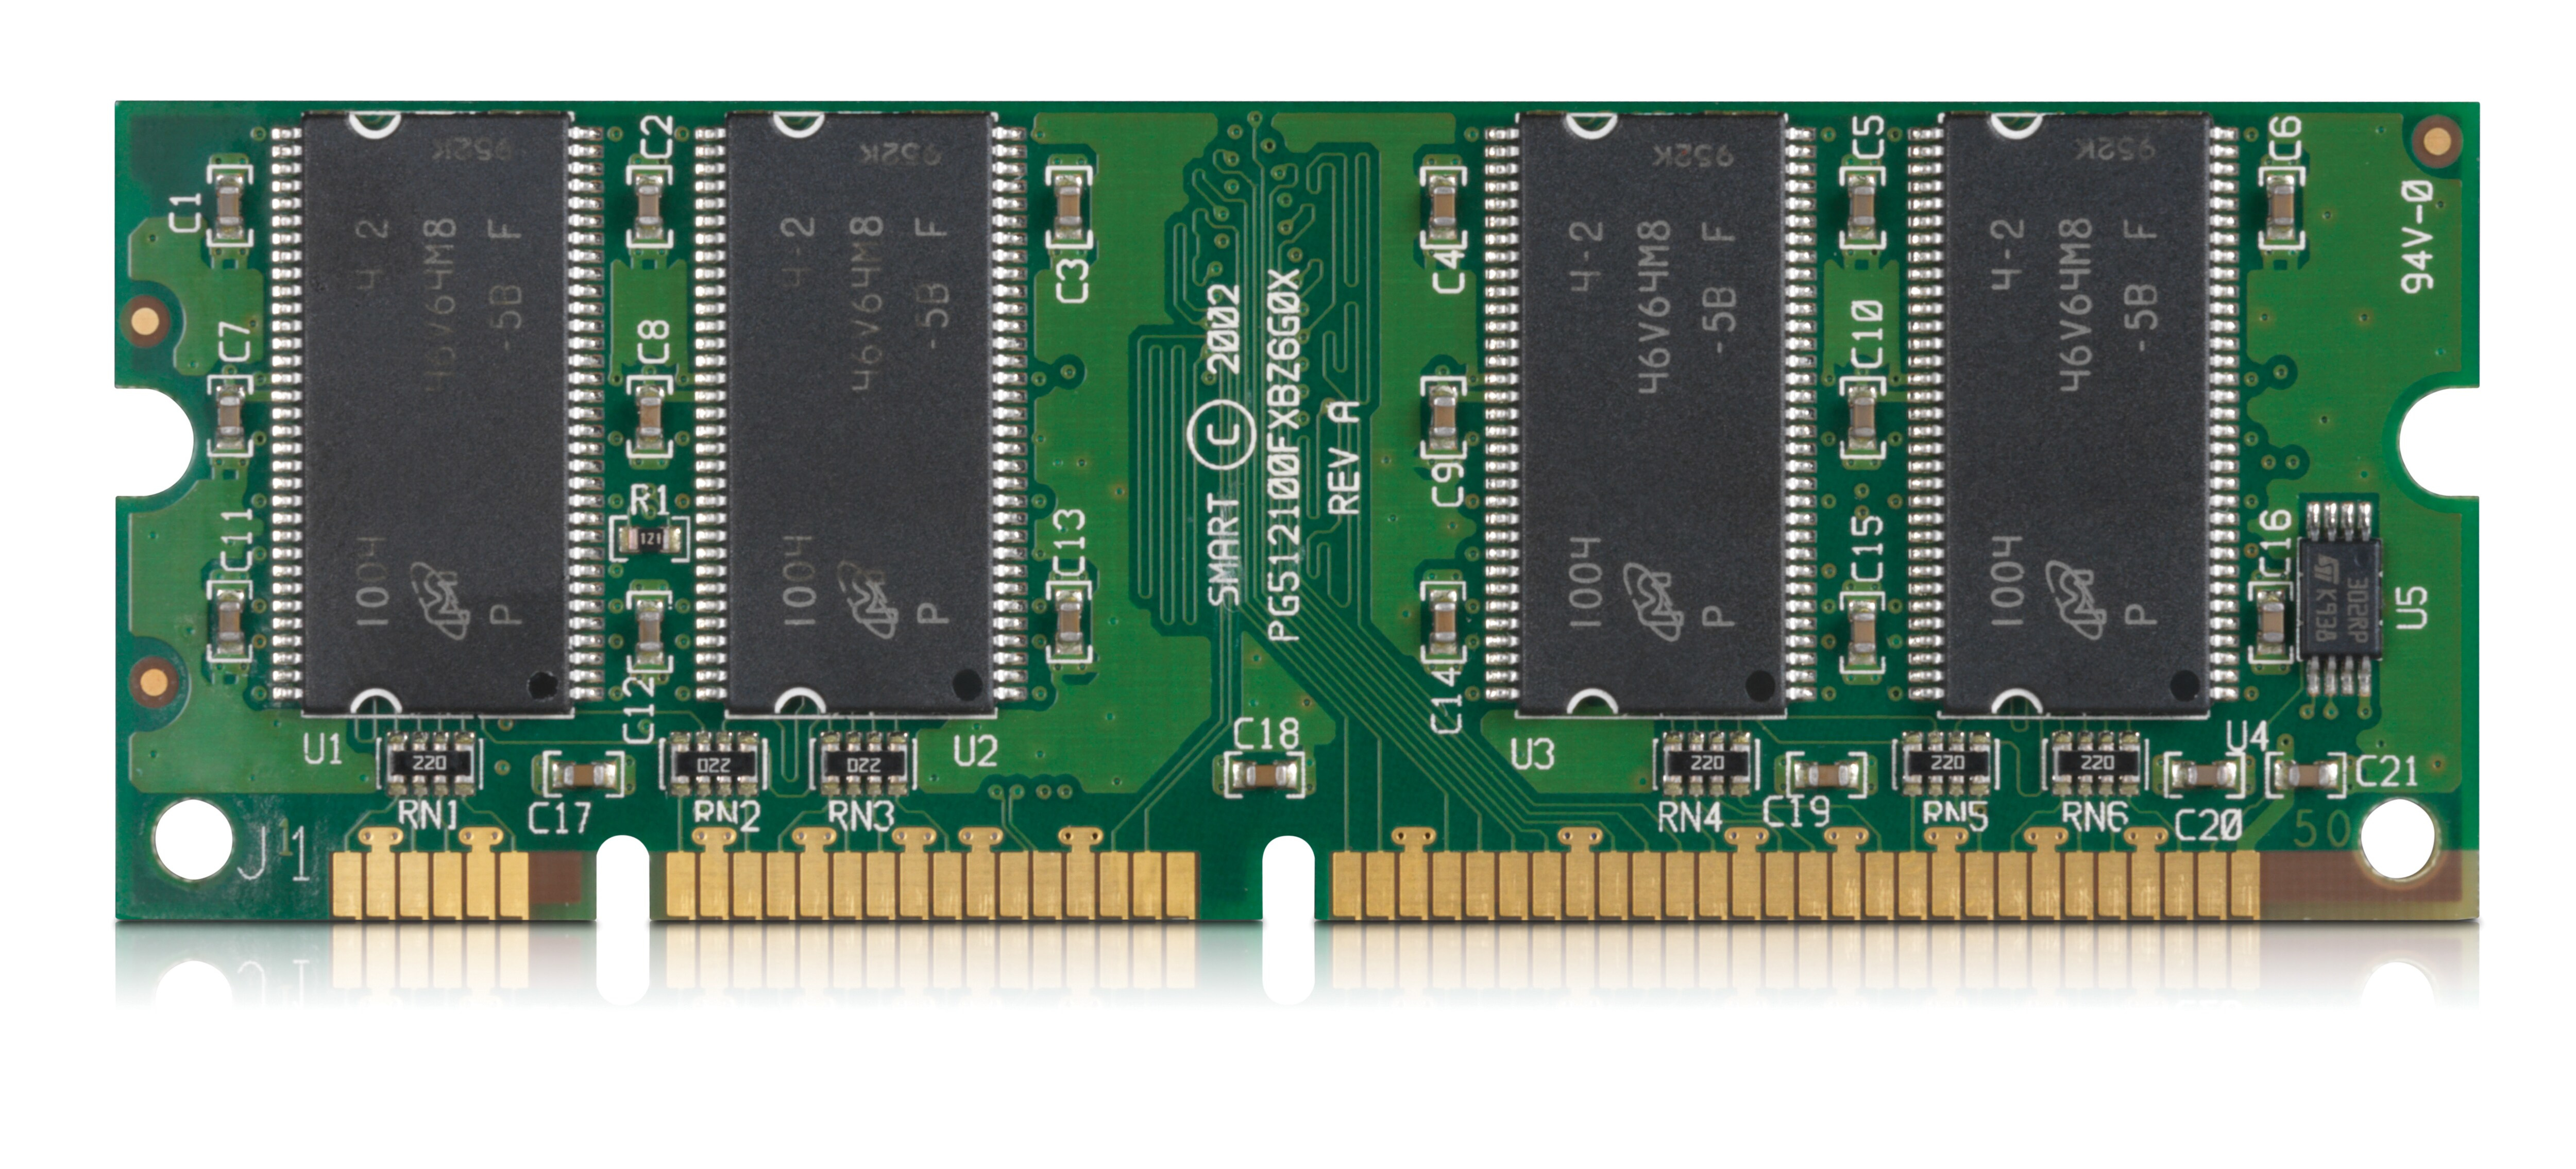 Q7558A